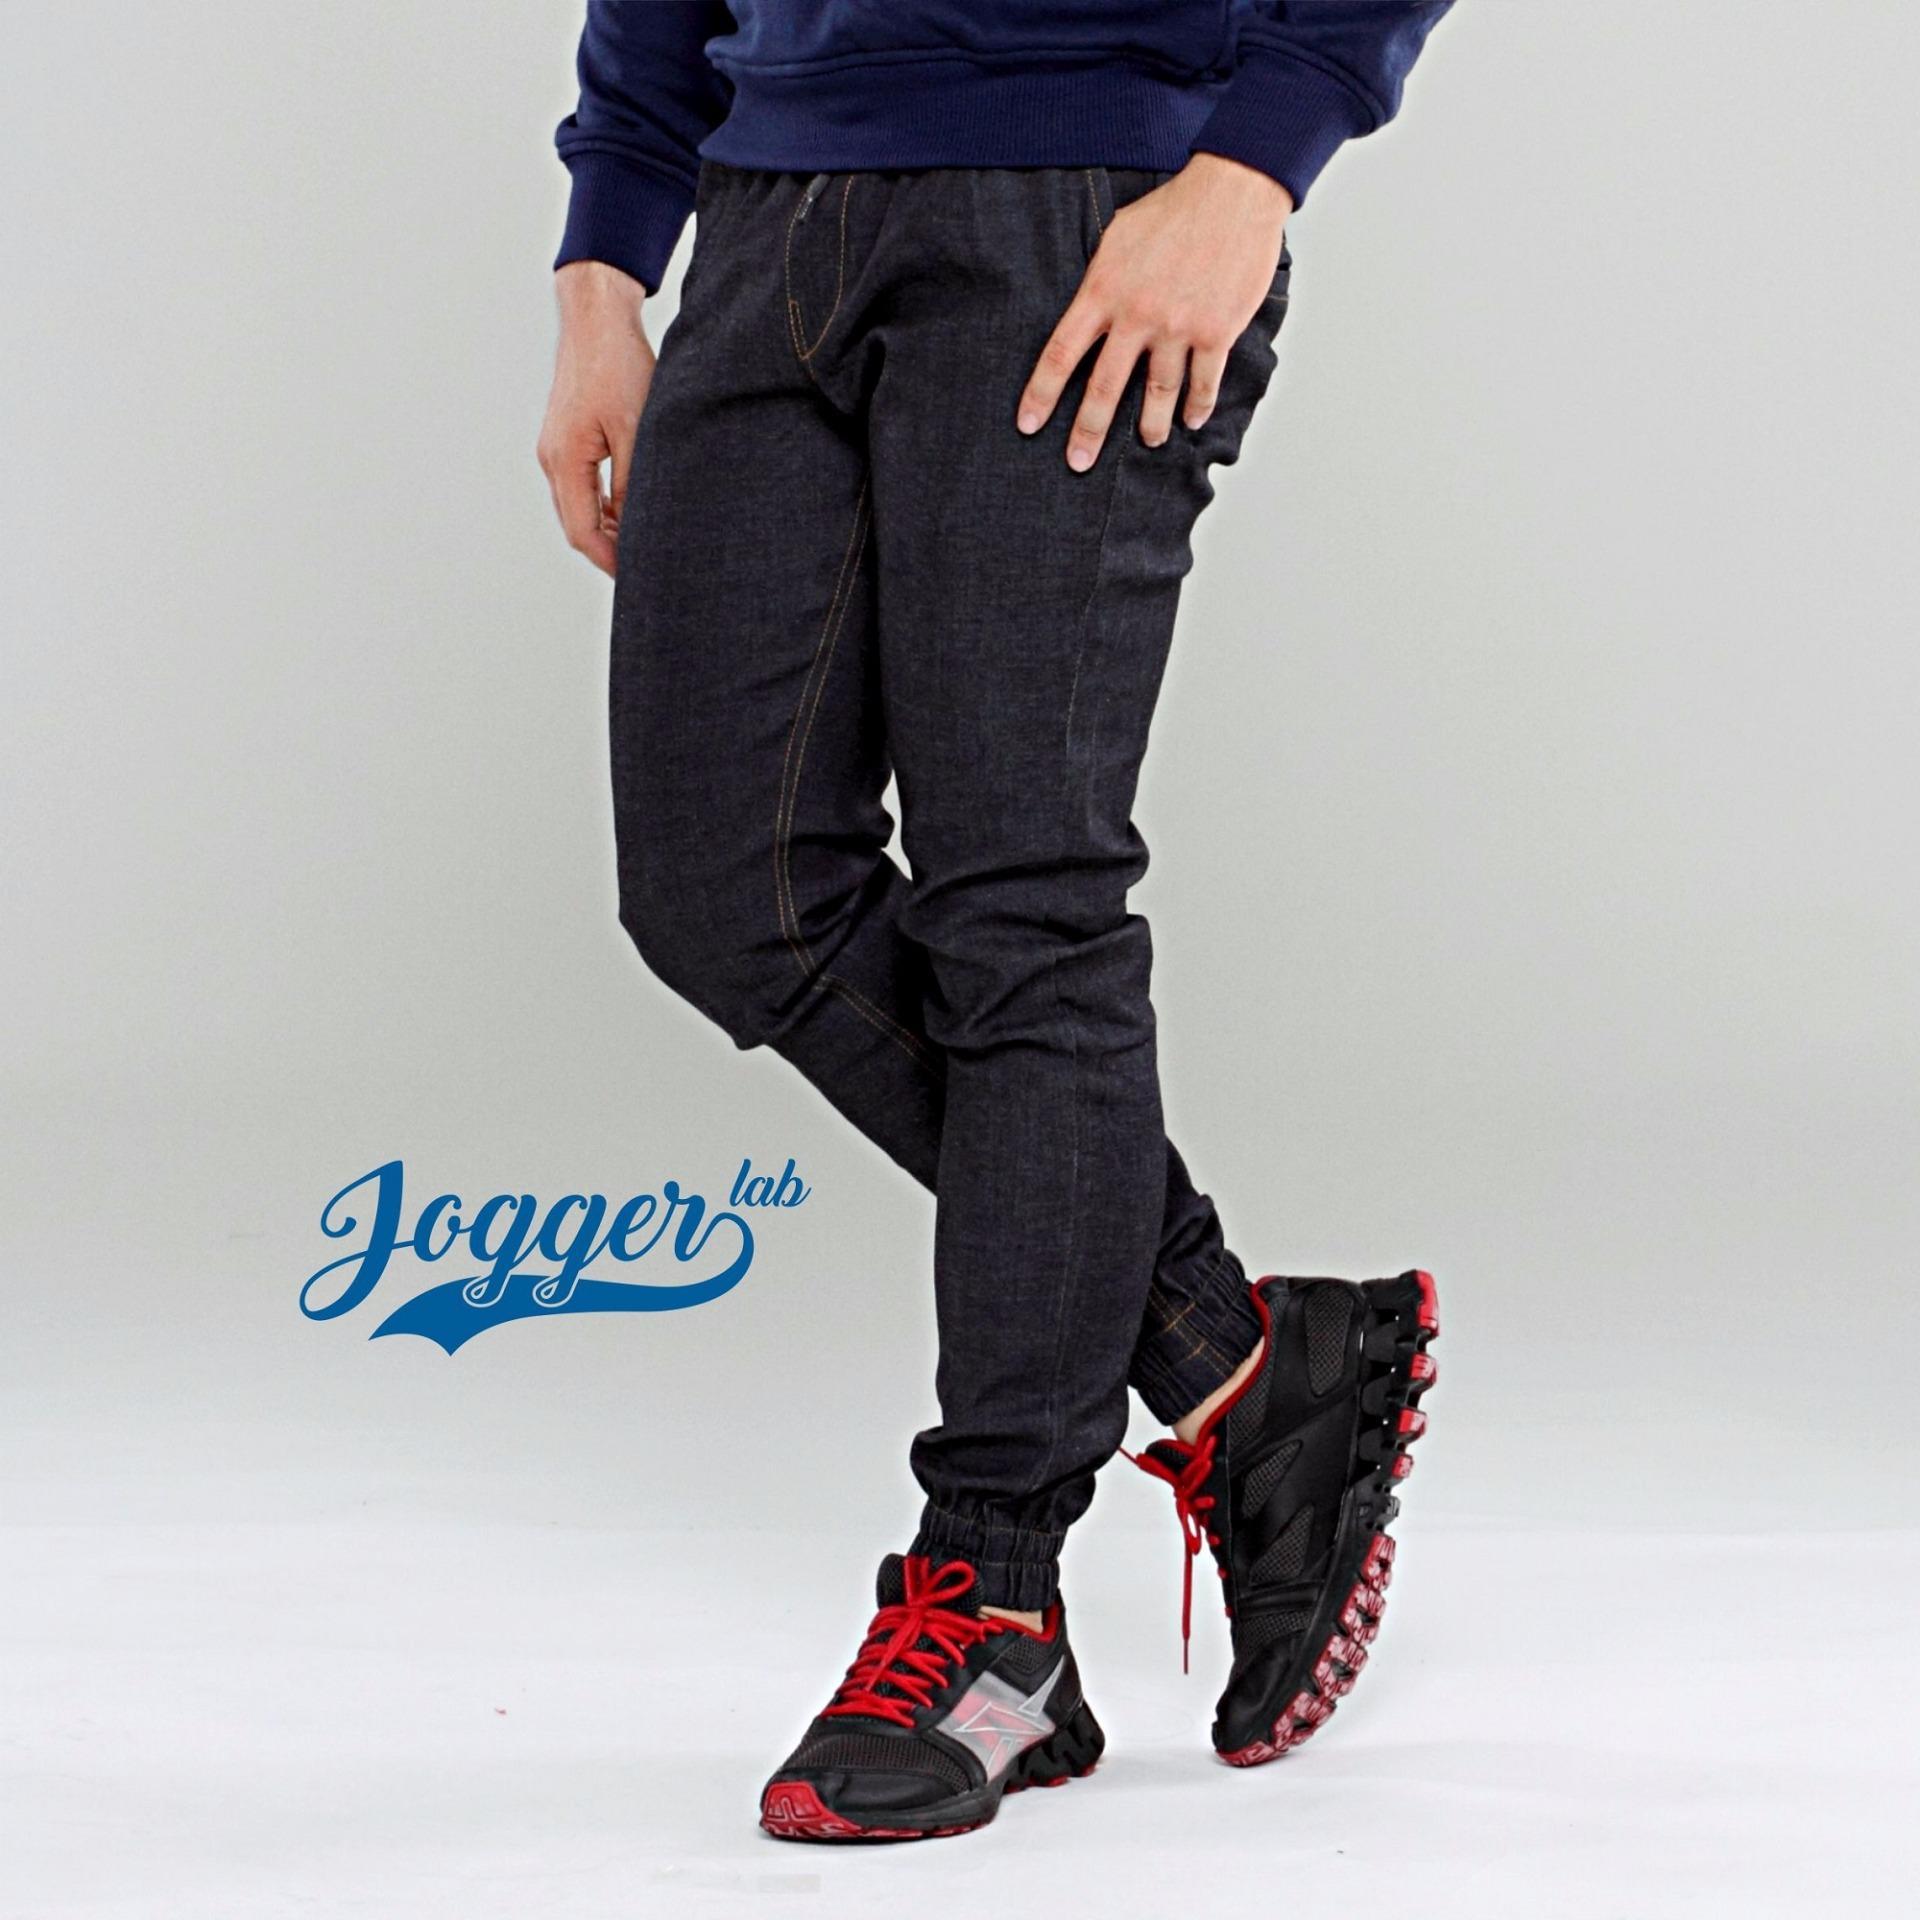 Perbandingan Harga Jogger Lab Jogger Jeans Black Indigo Jogger Lab Di Indonesia